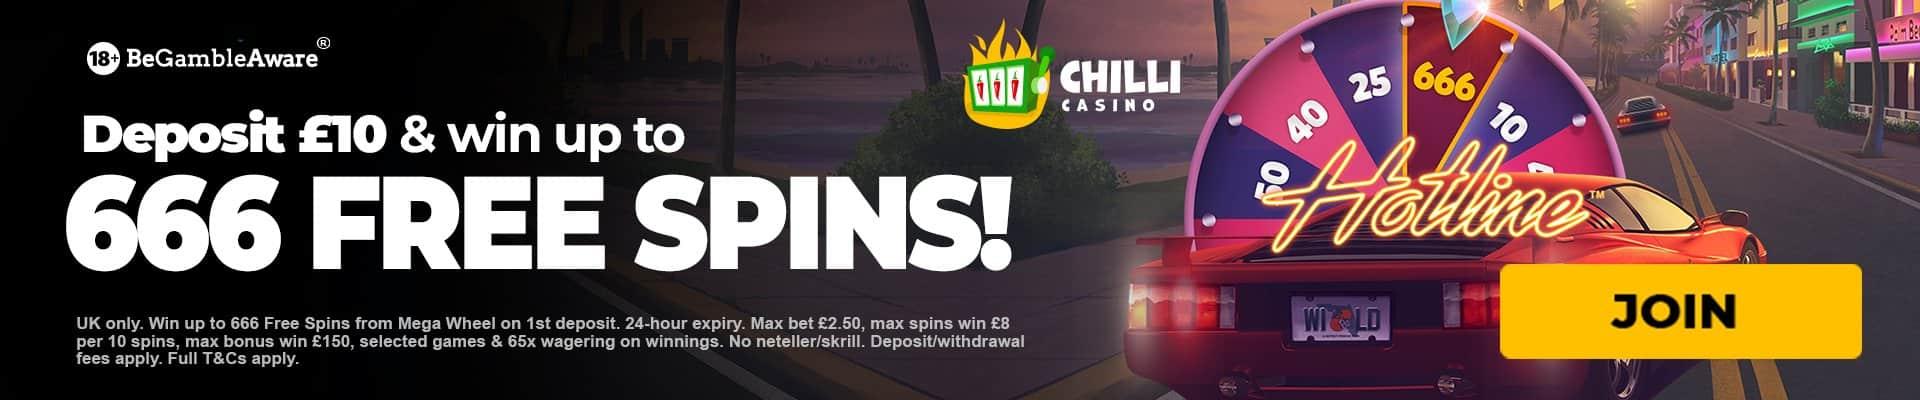 Chili casino free spins